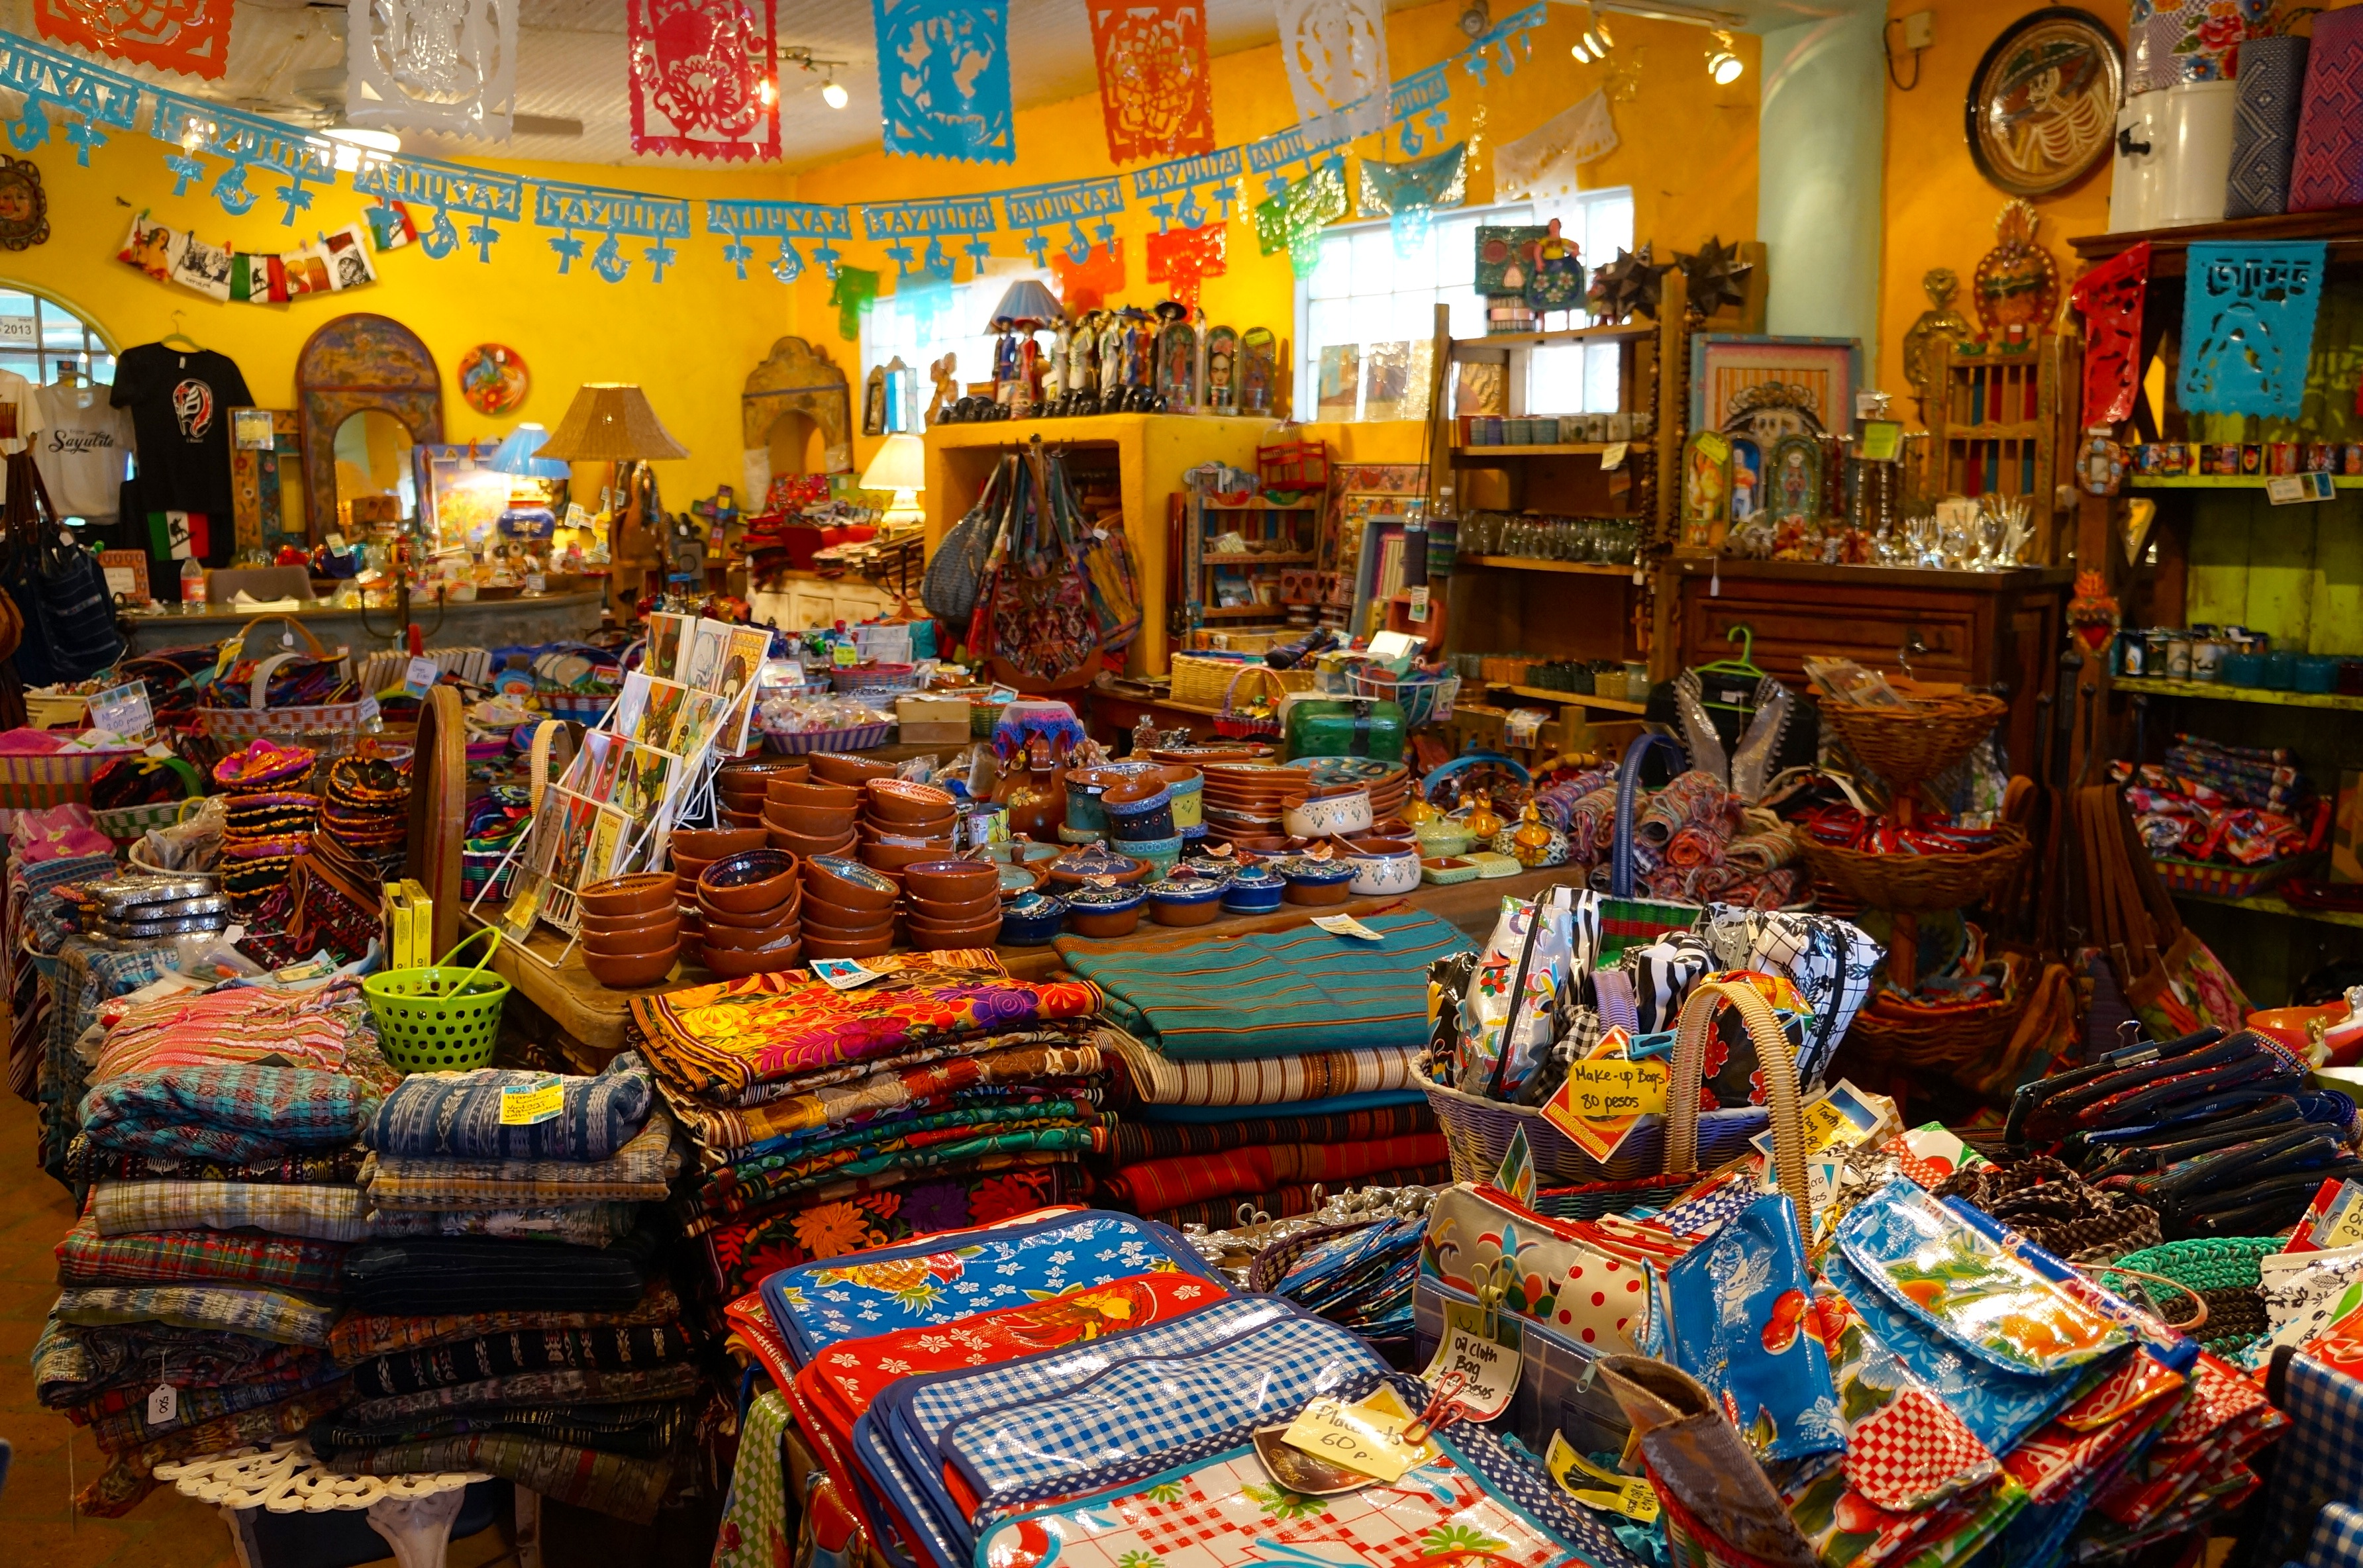 Gypsy Galleria